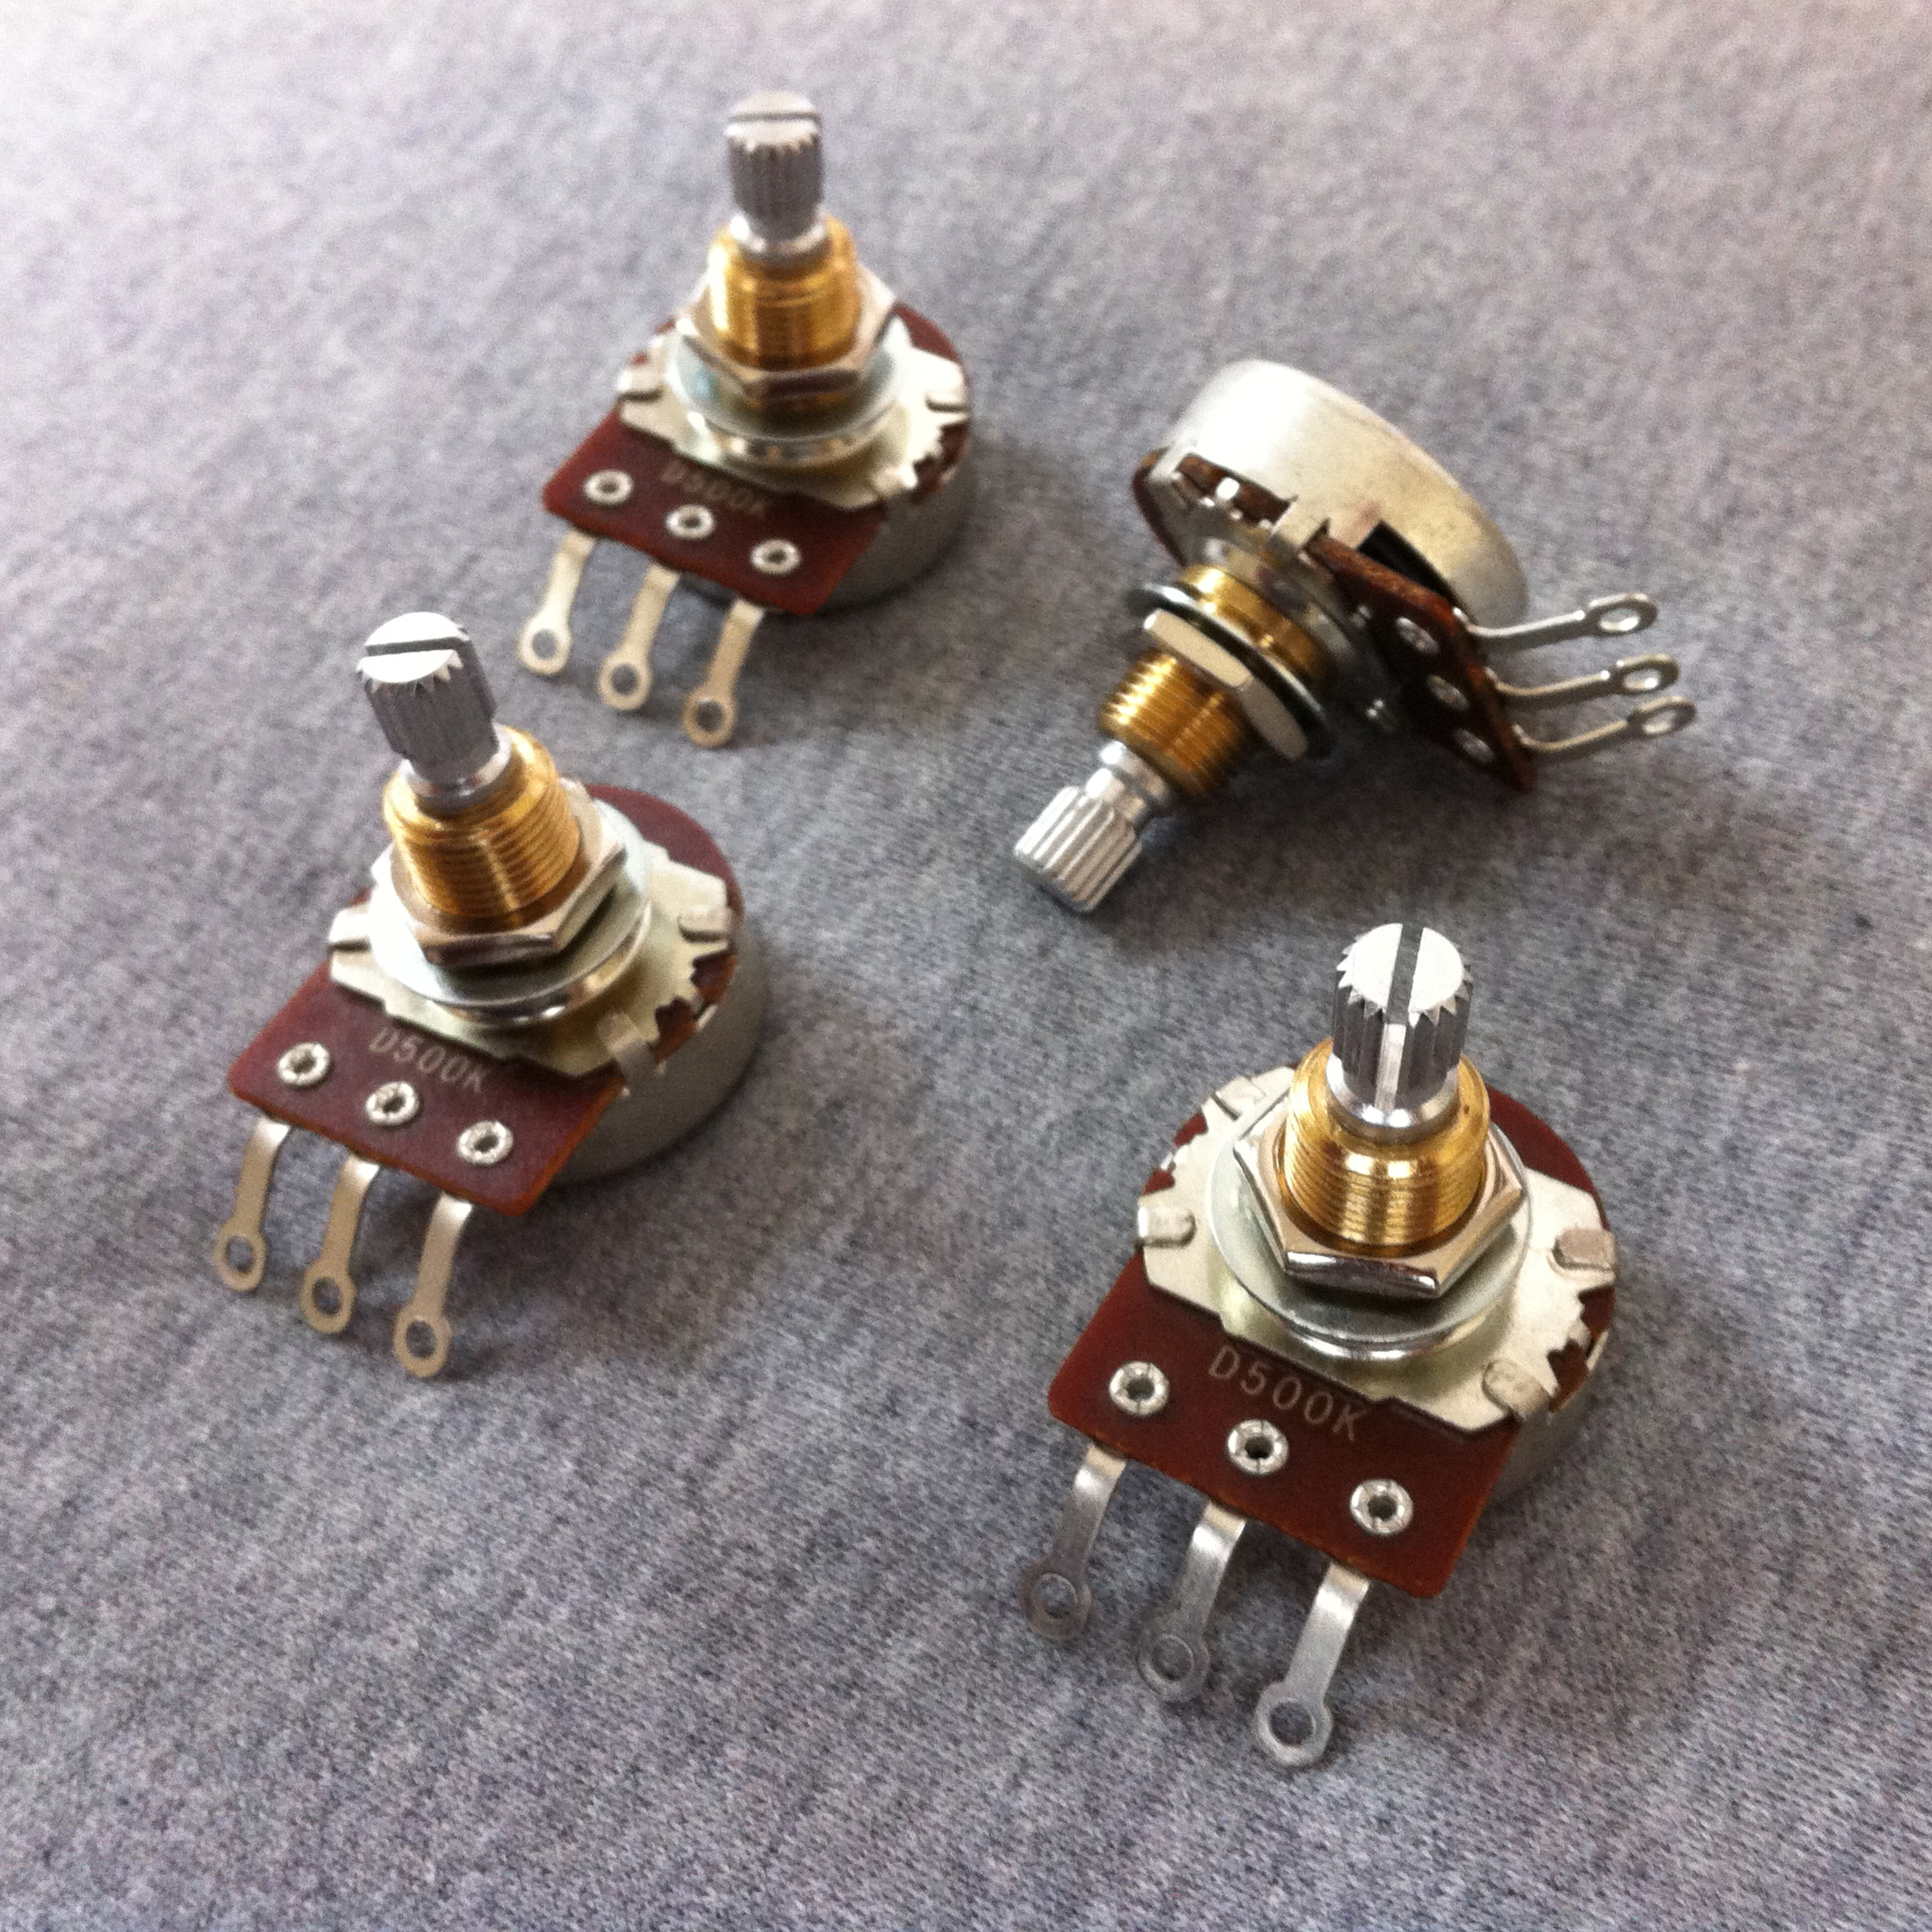 Epiphone Guitar Wiring Harness Kits Sheraton Elitist Diagram Elsalvadorla Gibson Es335 Prebuilt